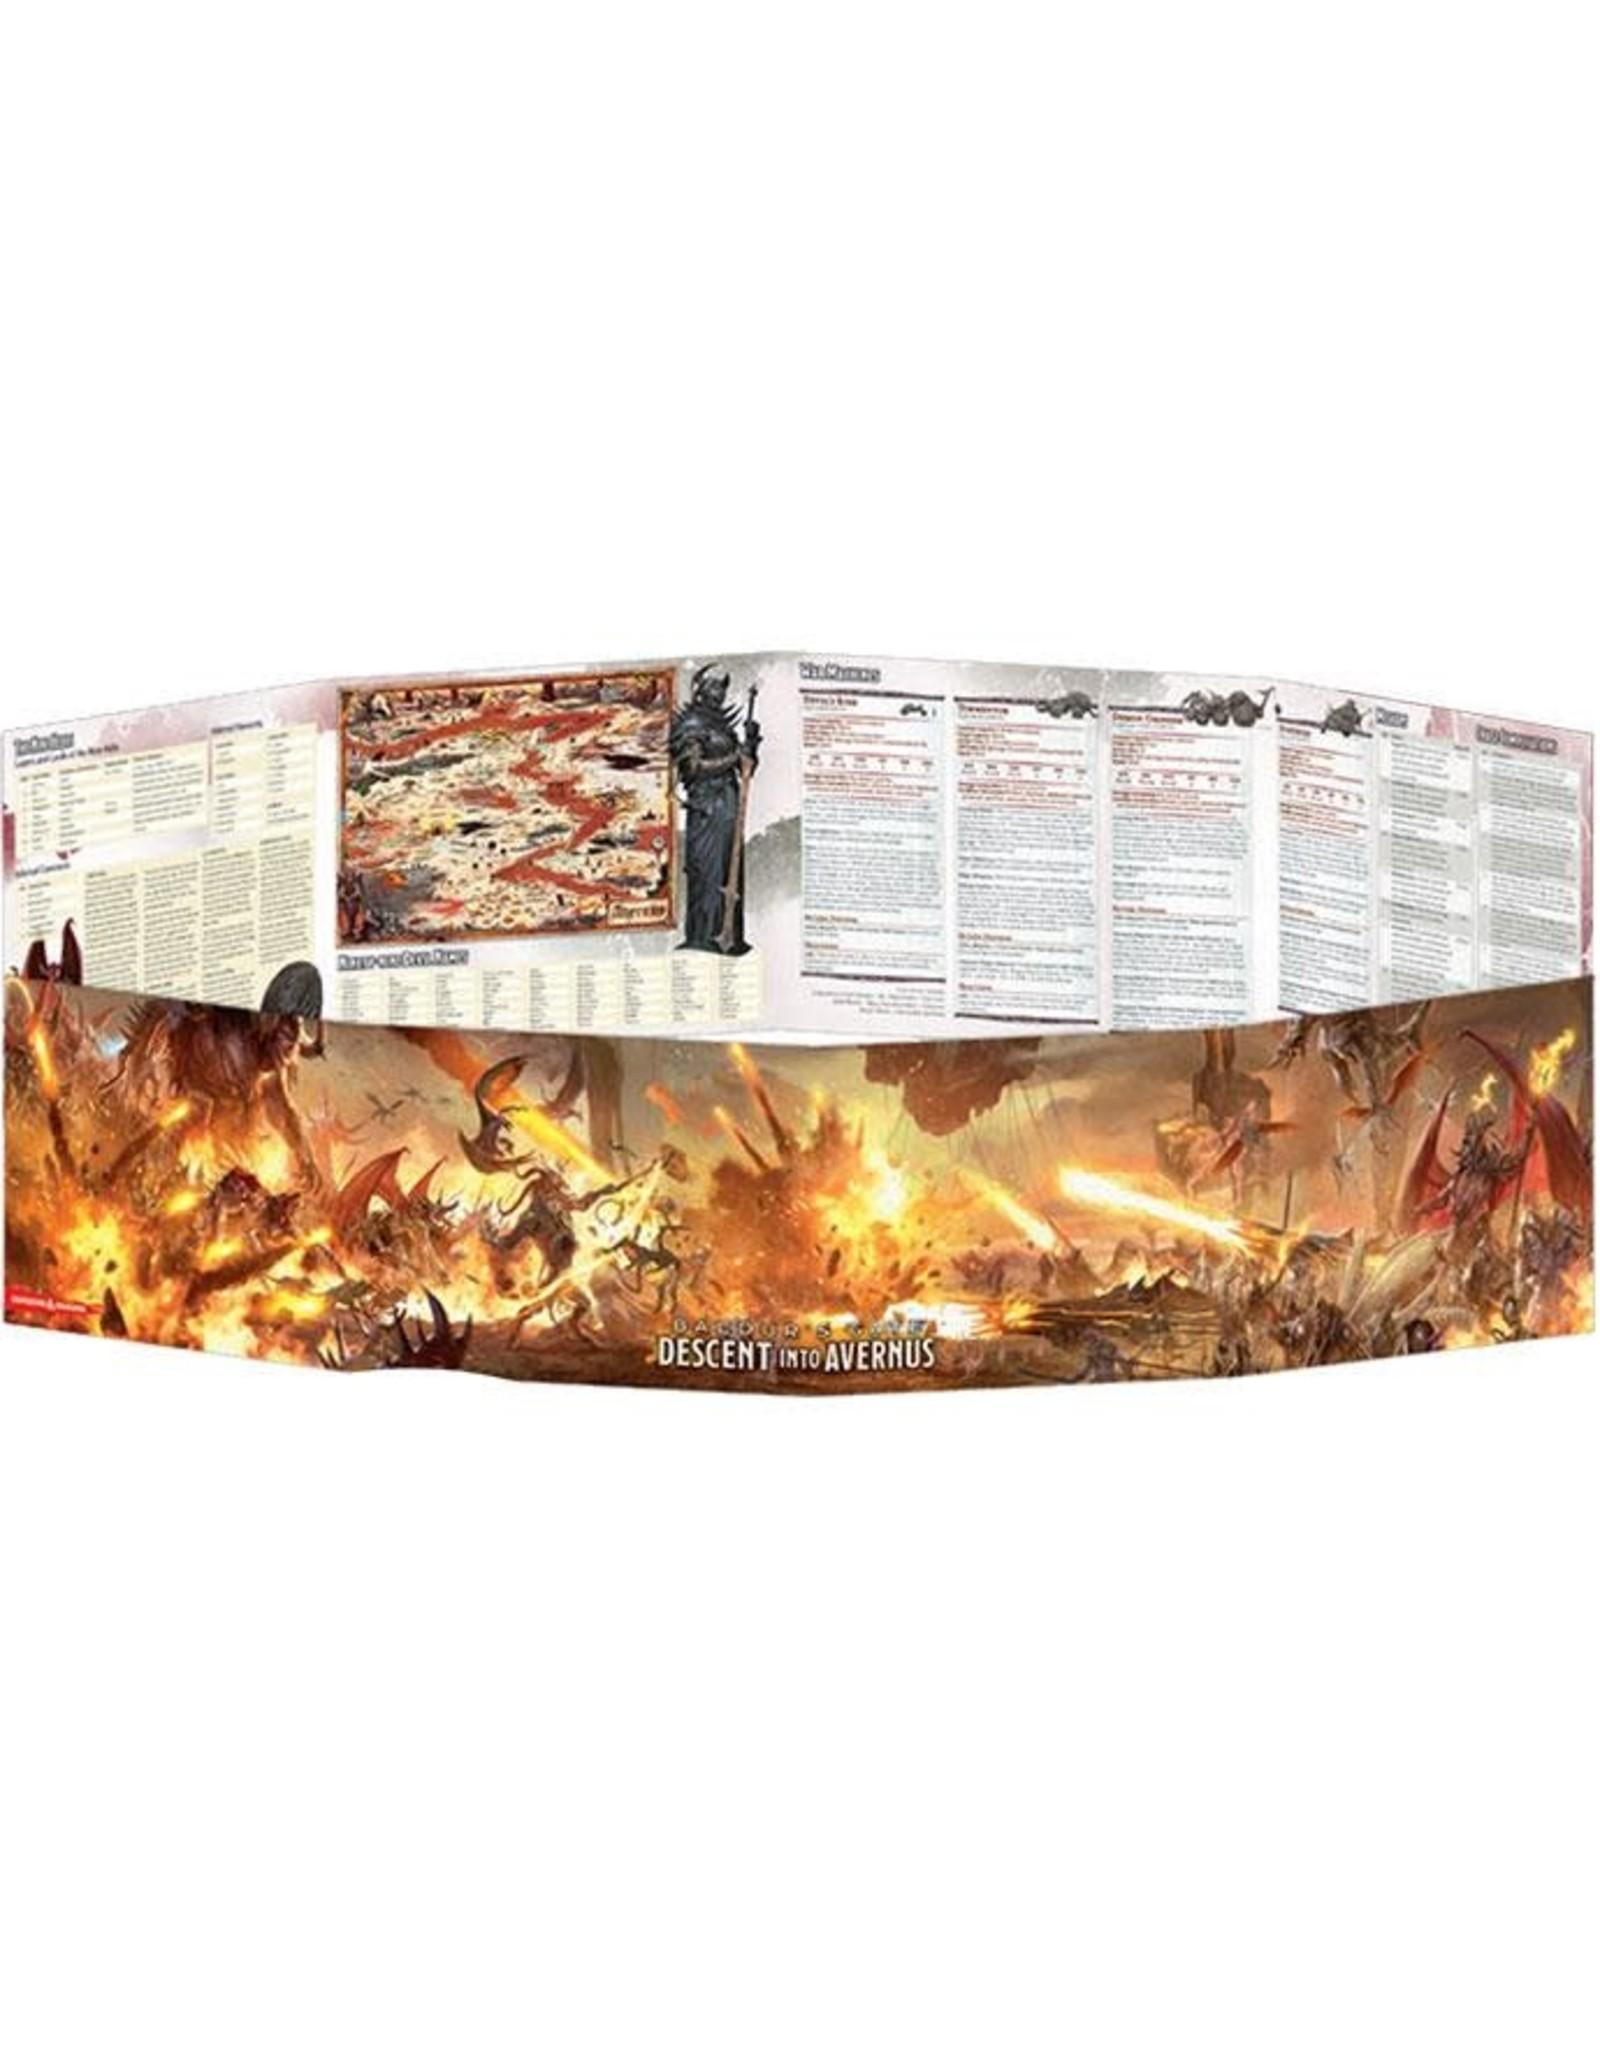 GaleForce Nine D&D 5th Edition: Descent into Avernus DM Screen